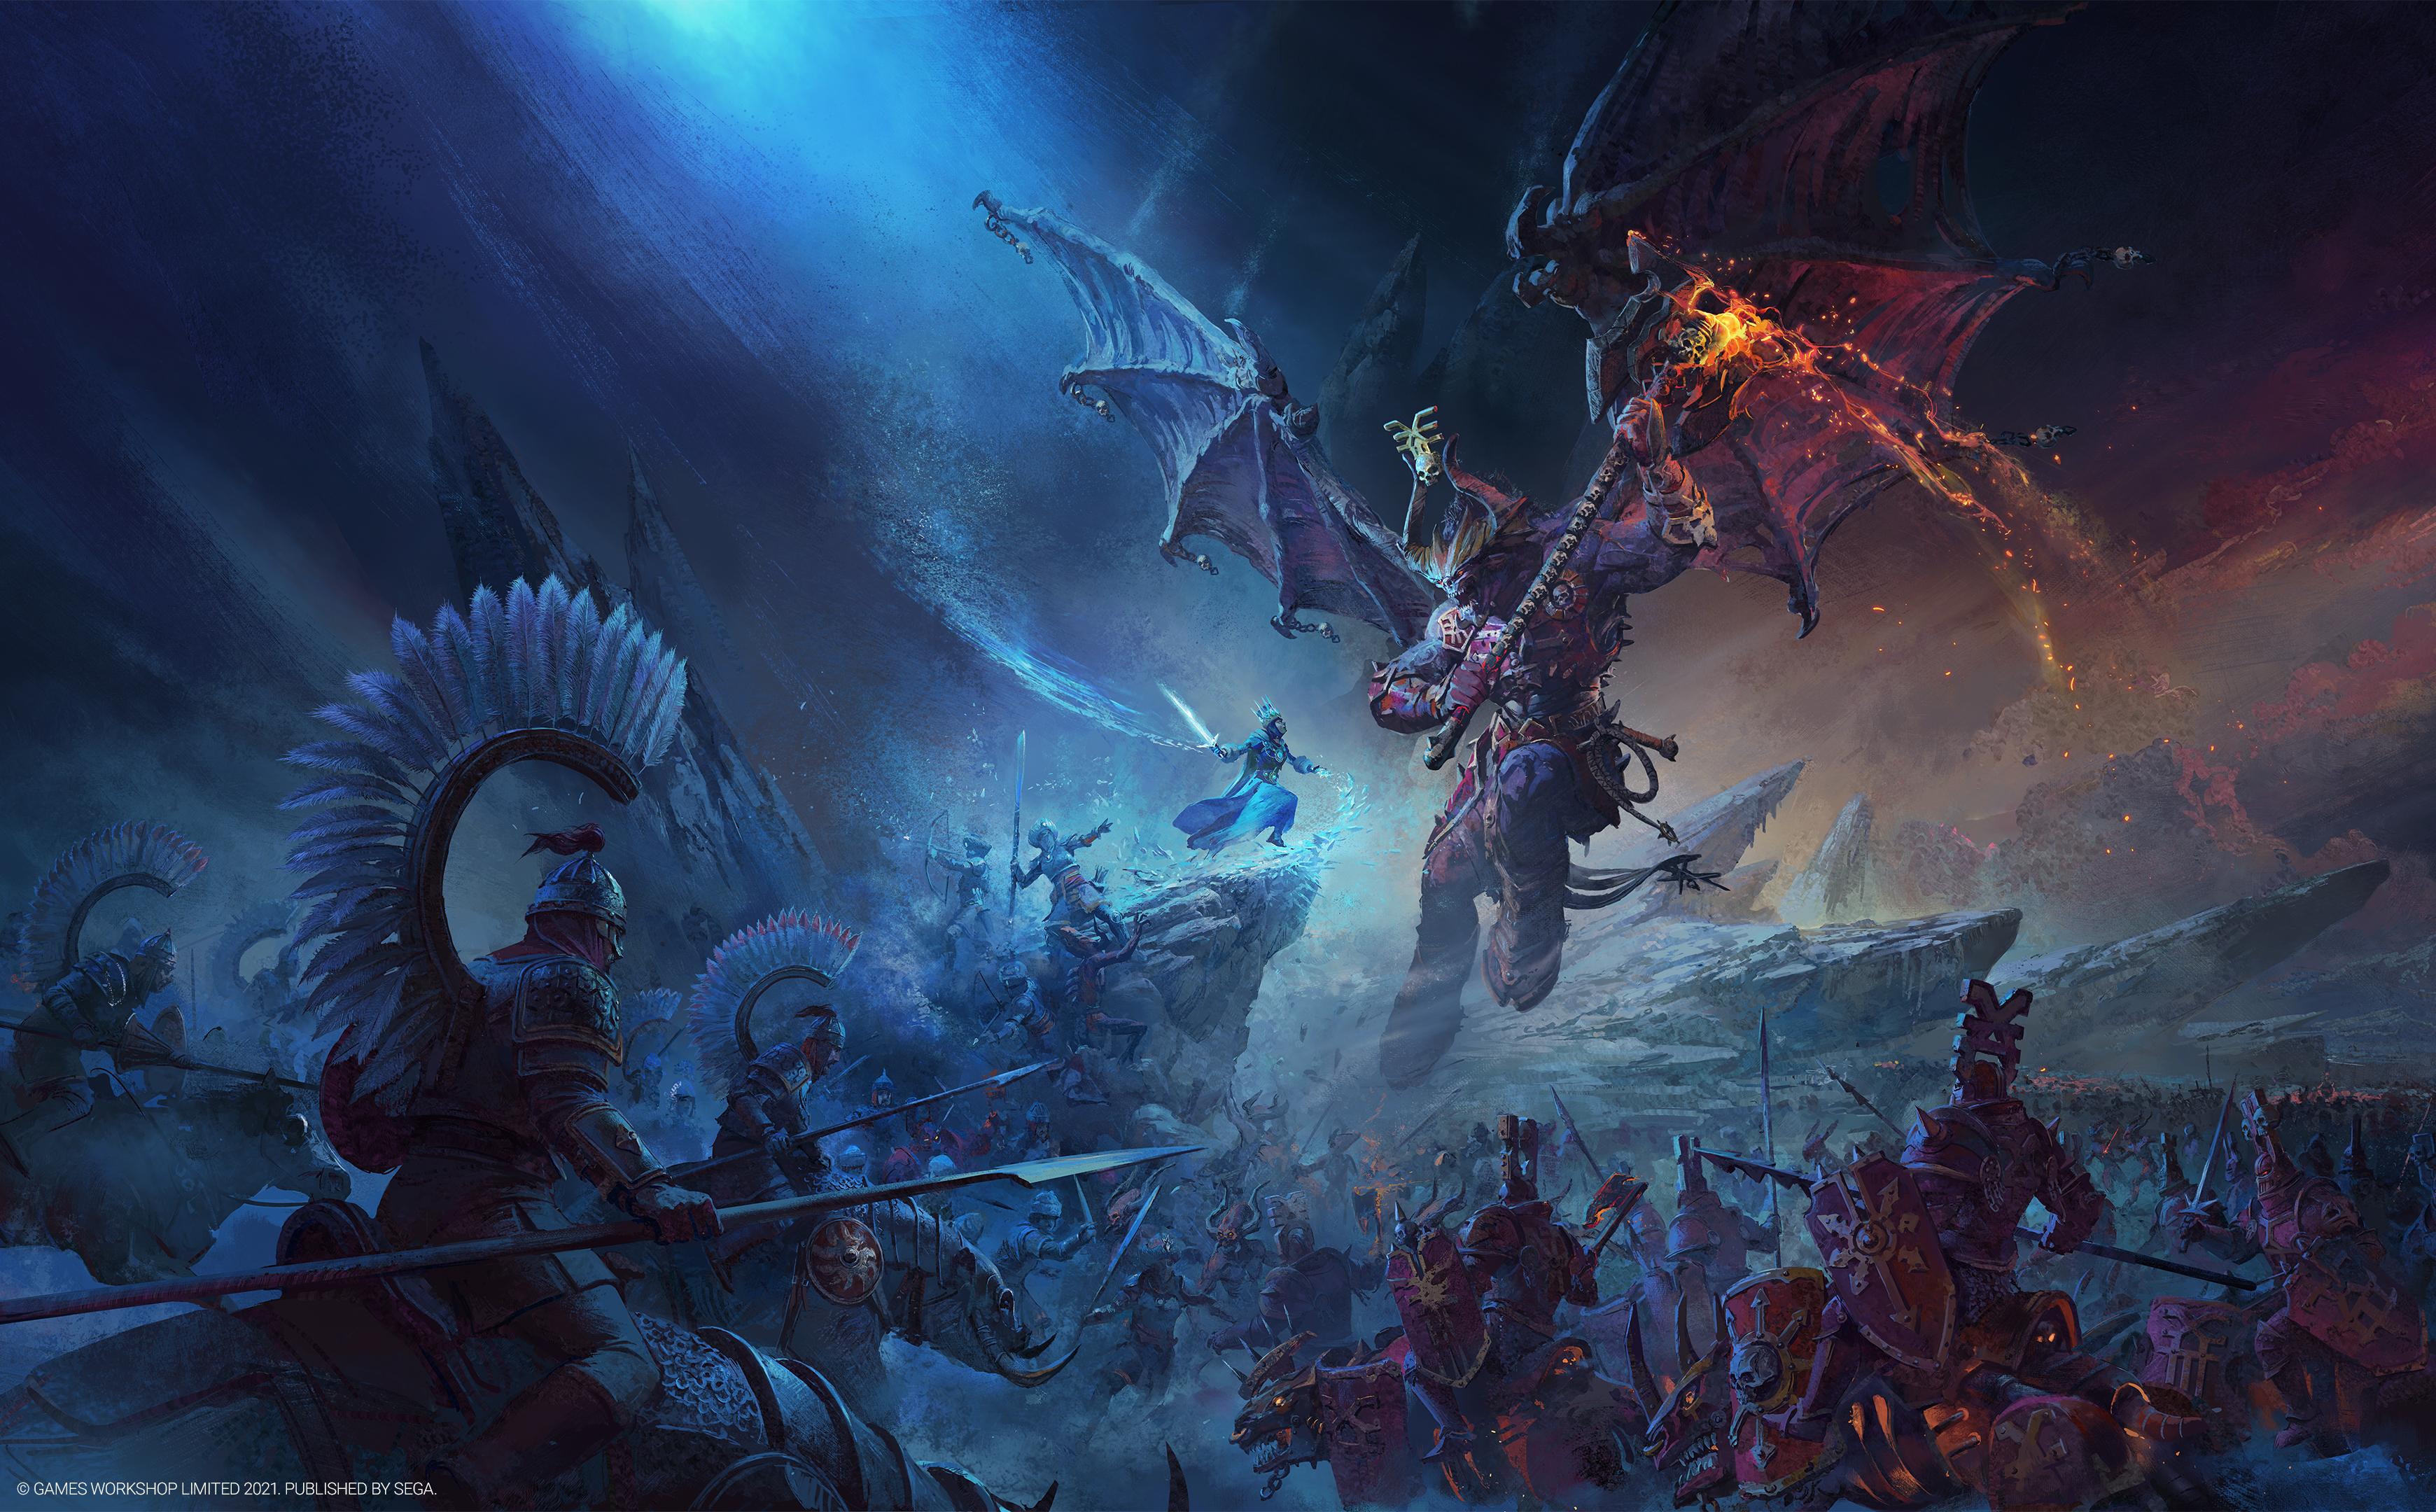 General 3480x2160 Total War: WARHAMMER III video games video game art digital art demon ice Queen  crown Games Workshop Axe night spear bow sword Chaos